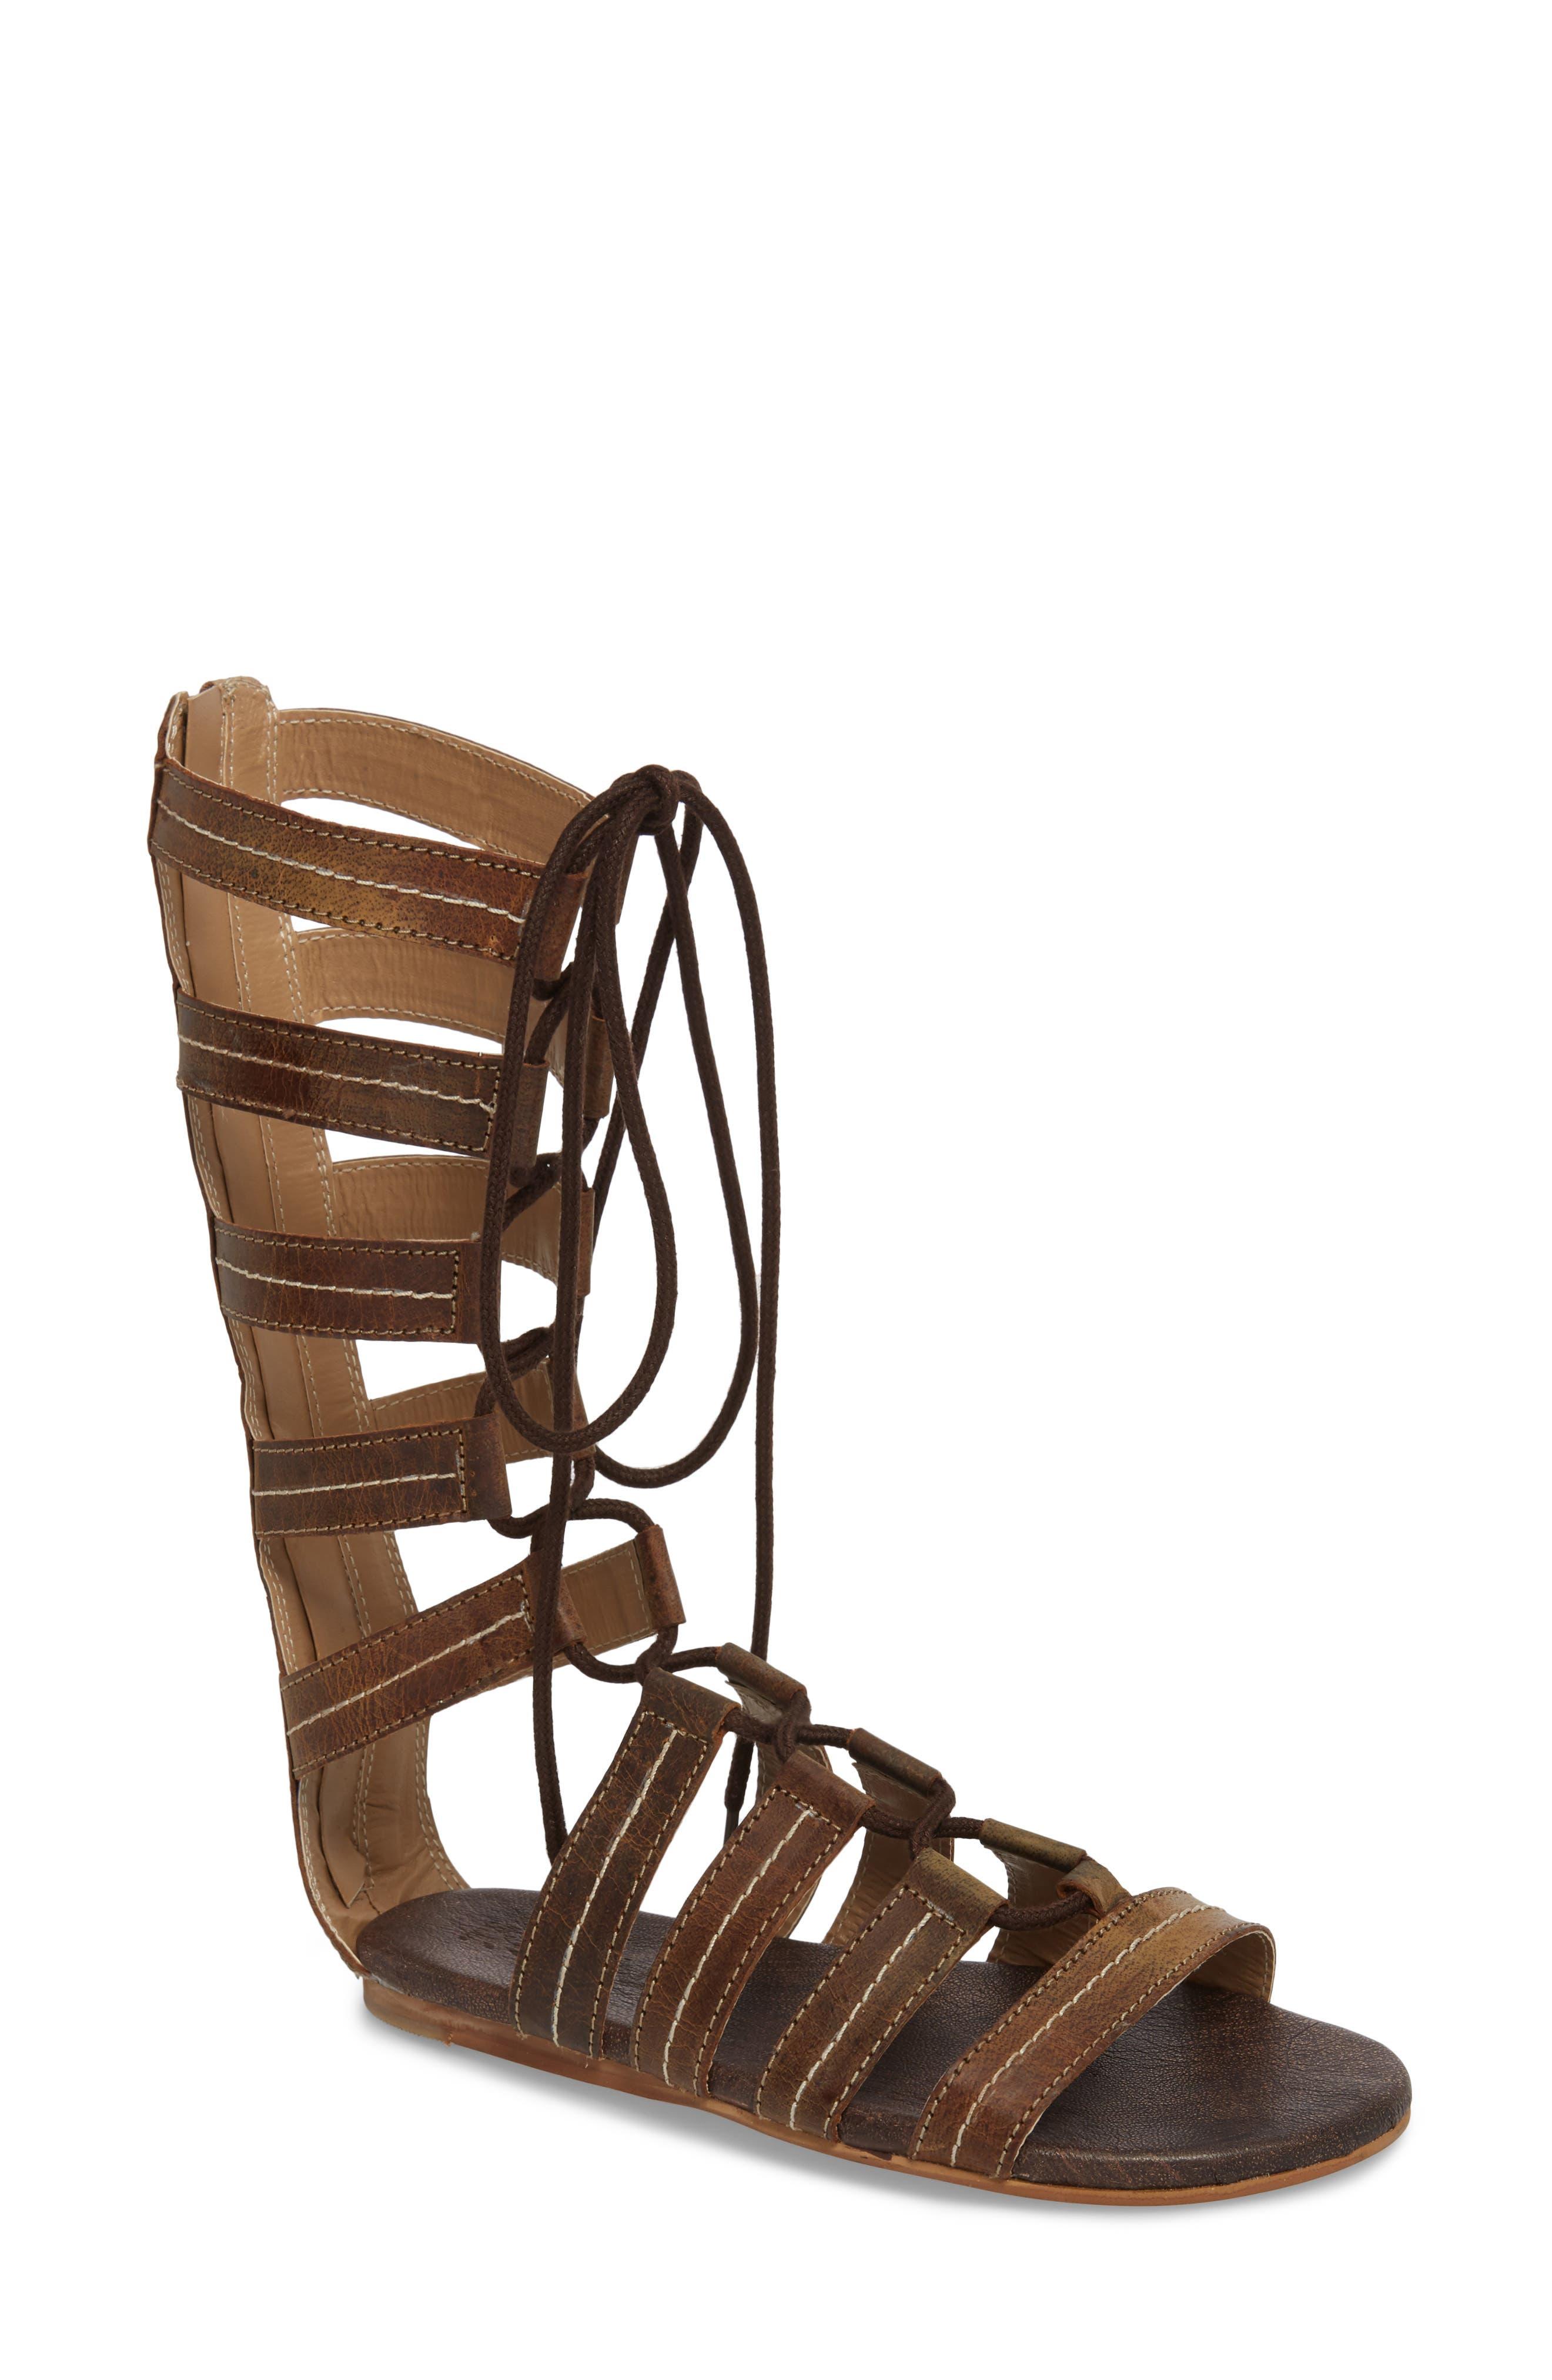 Rhea Lace-Up Gladiator Sandal,                             Main thumbnail 1, color,                             TAN GREENLAND